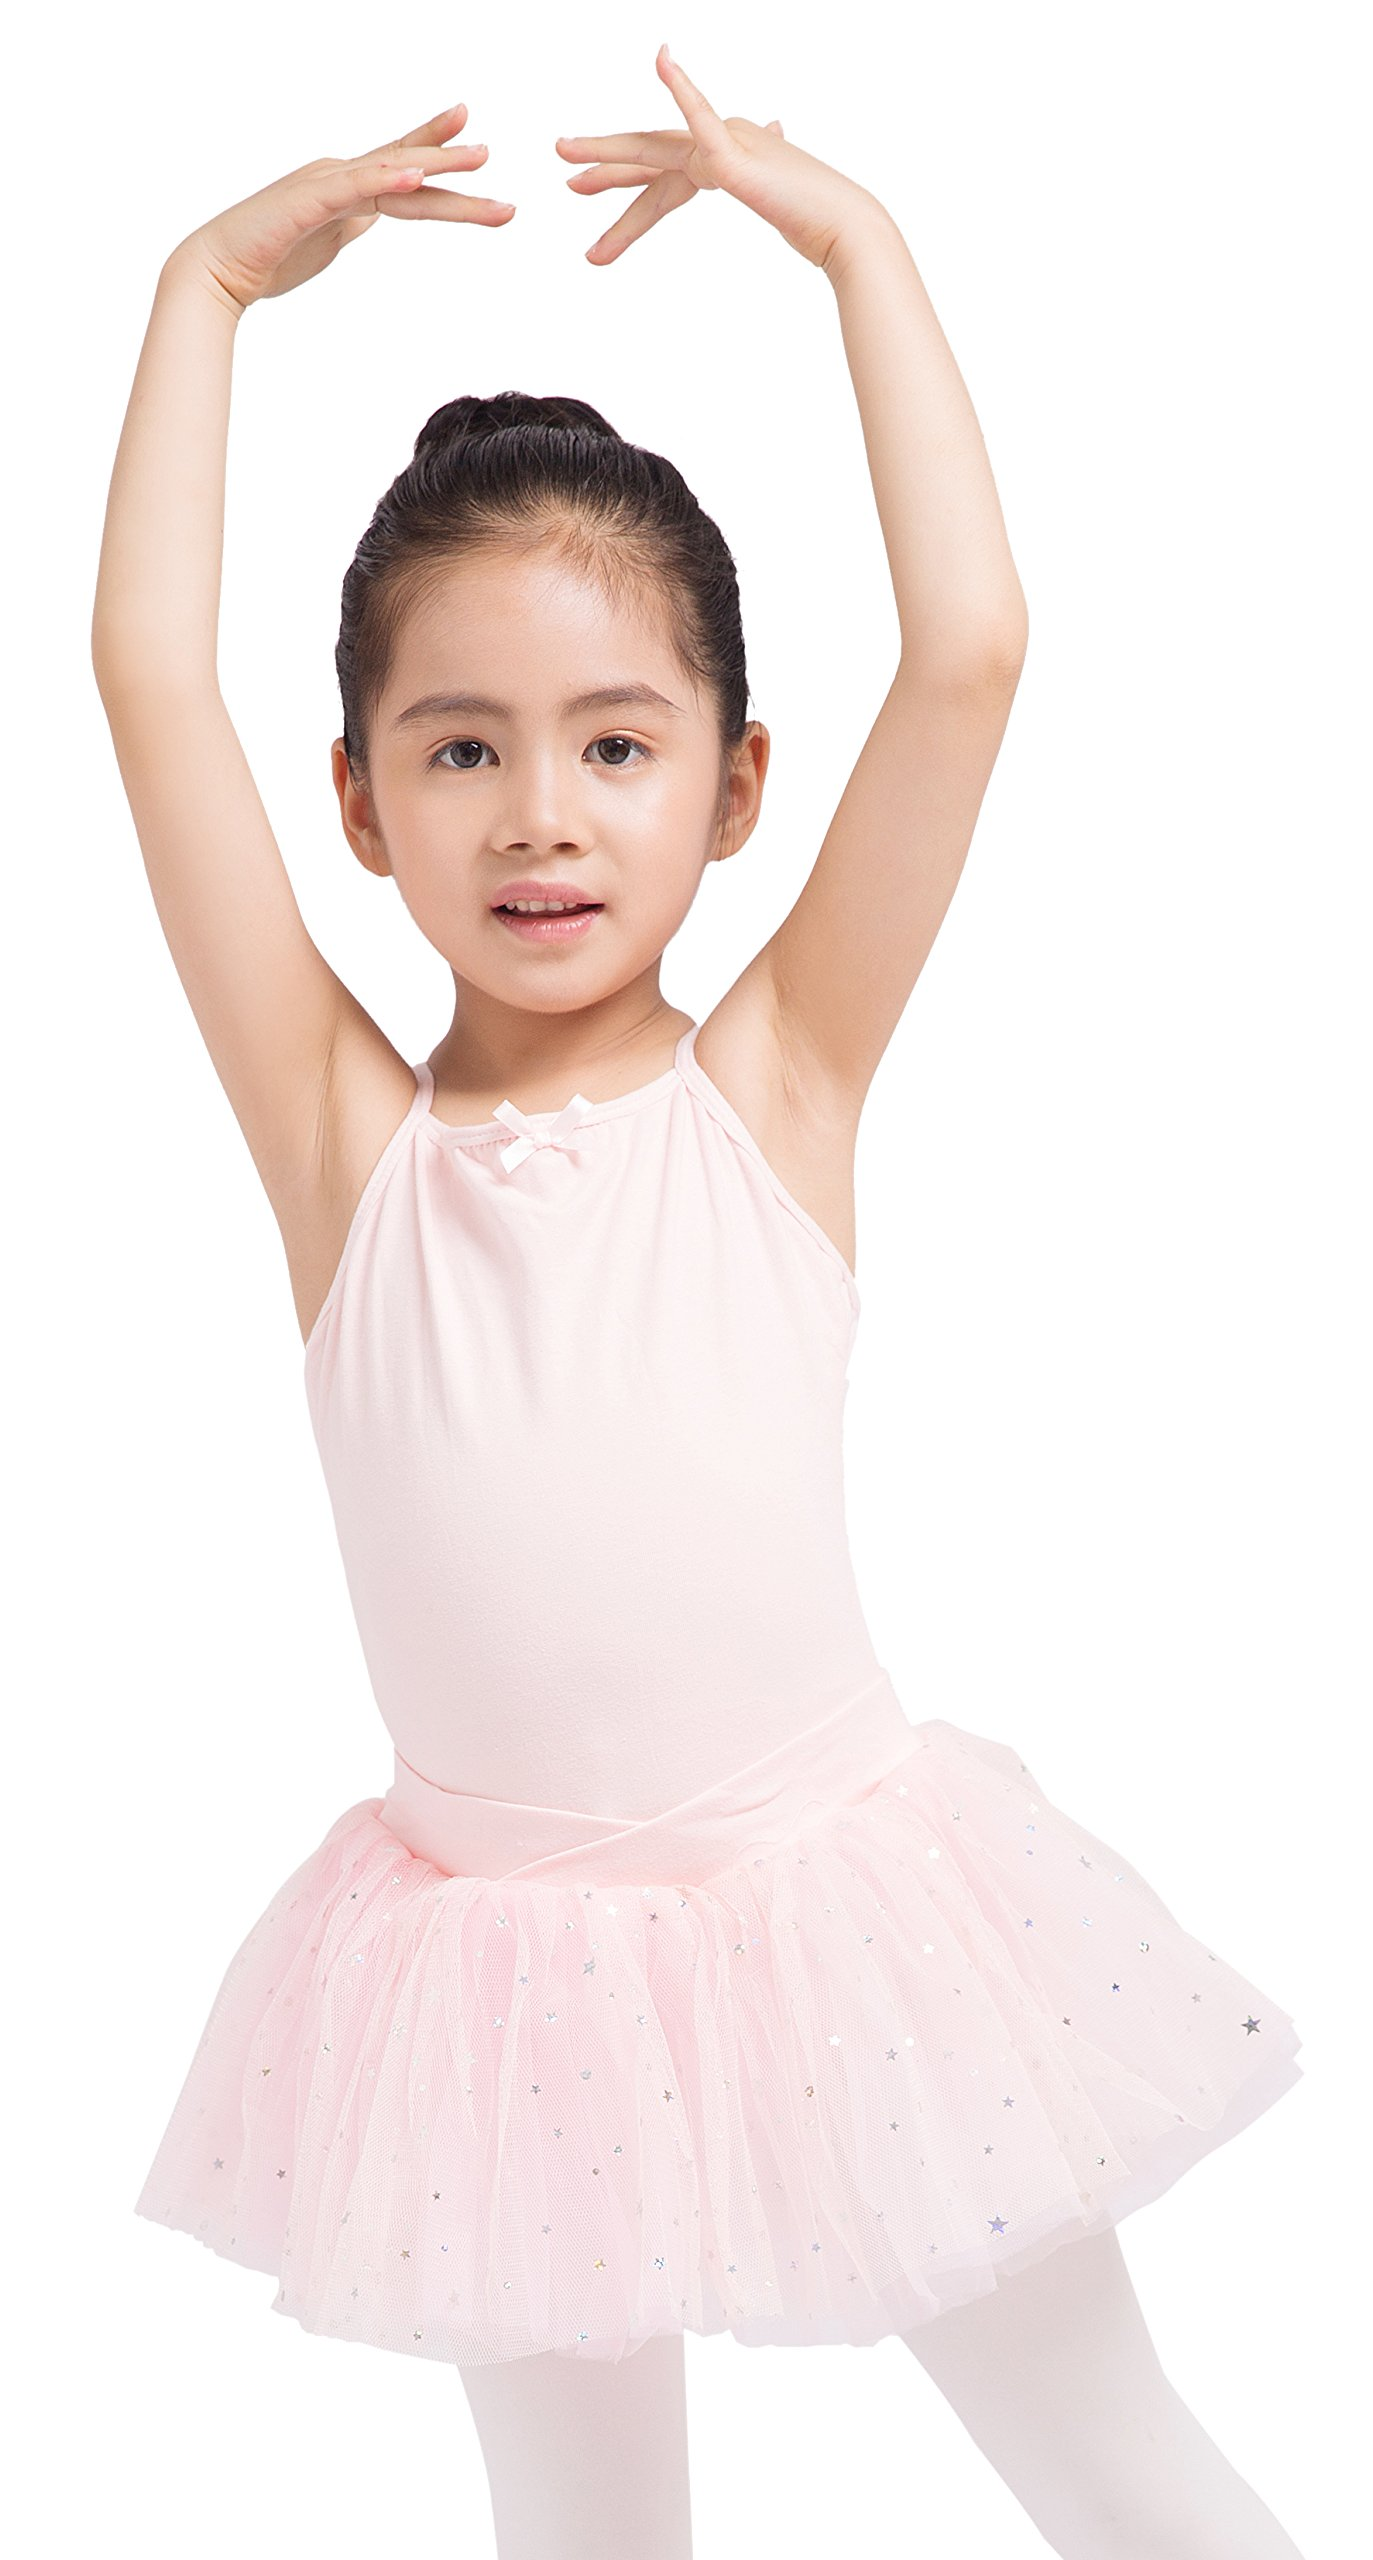 Dancina Leotard Camisole Ballet Tutu Dress Future Ballerina Dance Class Birthday Gift Outfit 3 Ballet Pink